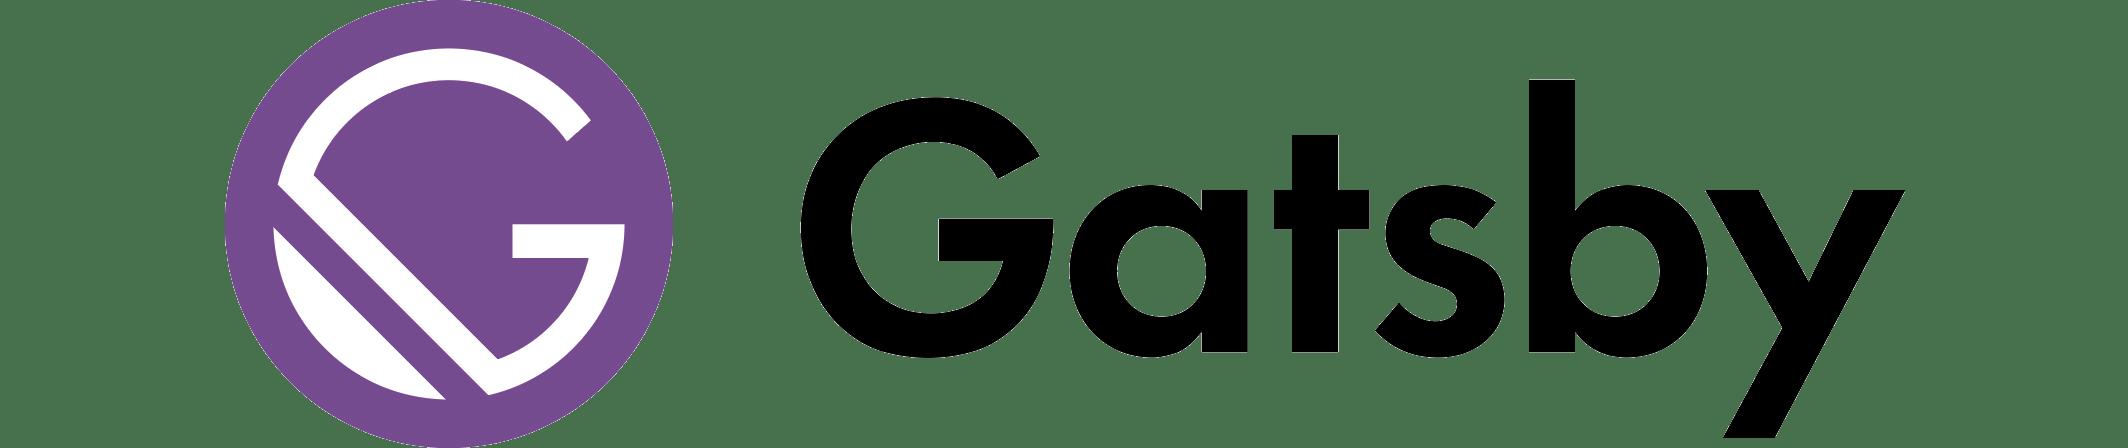 gatsby js logo